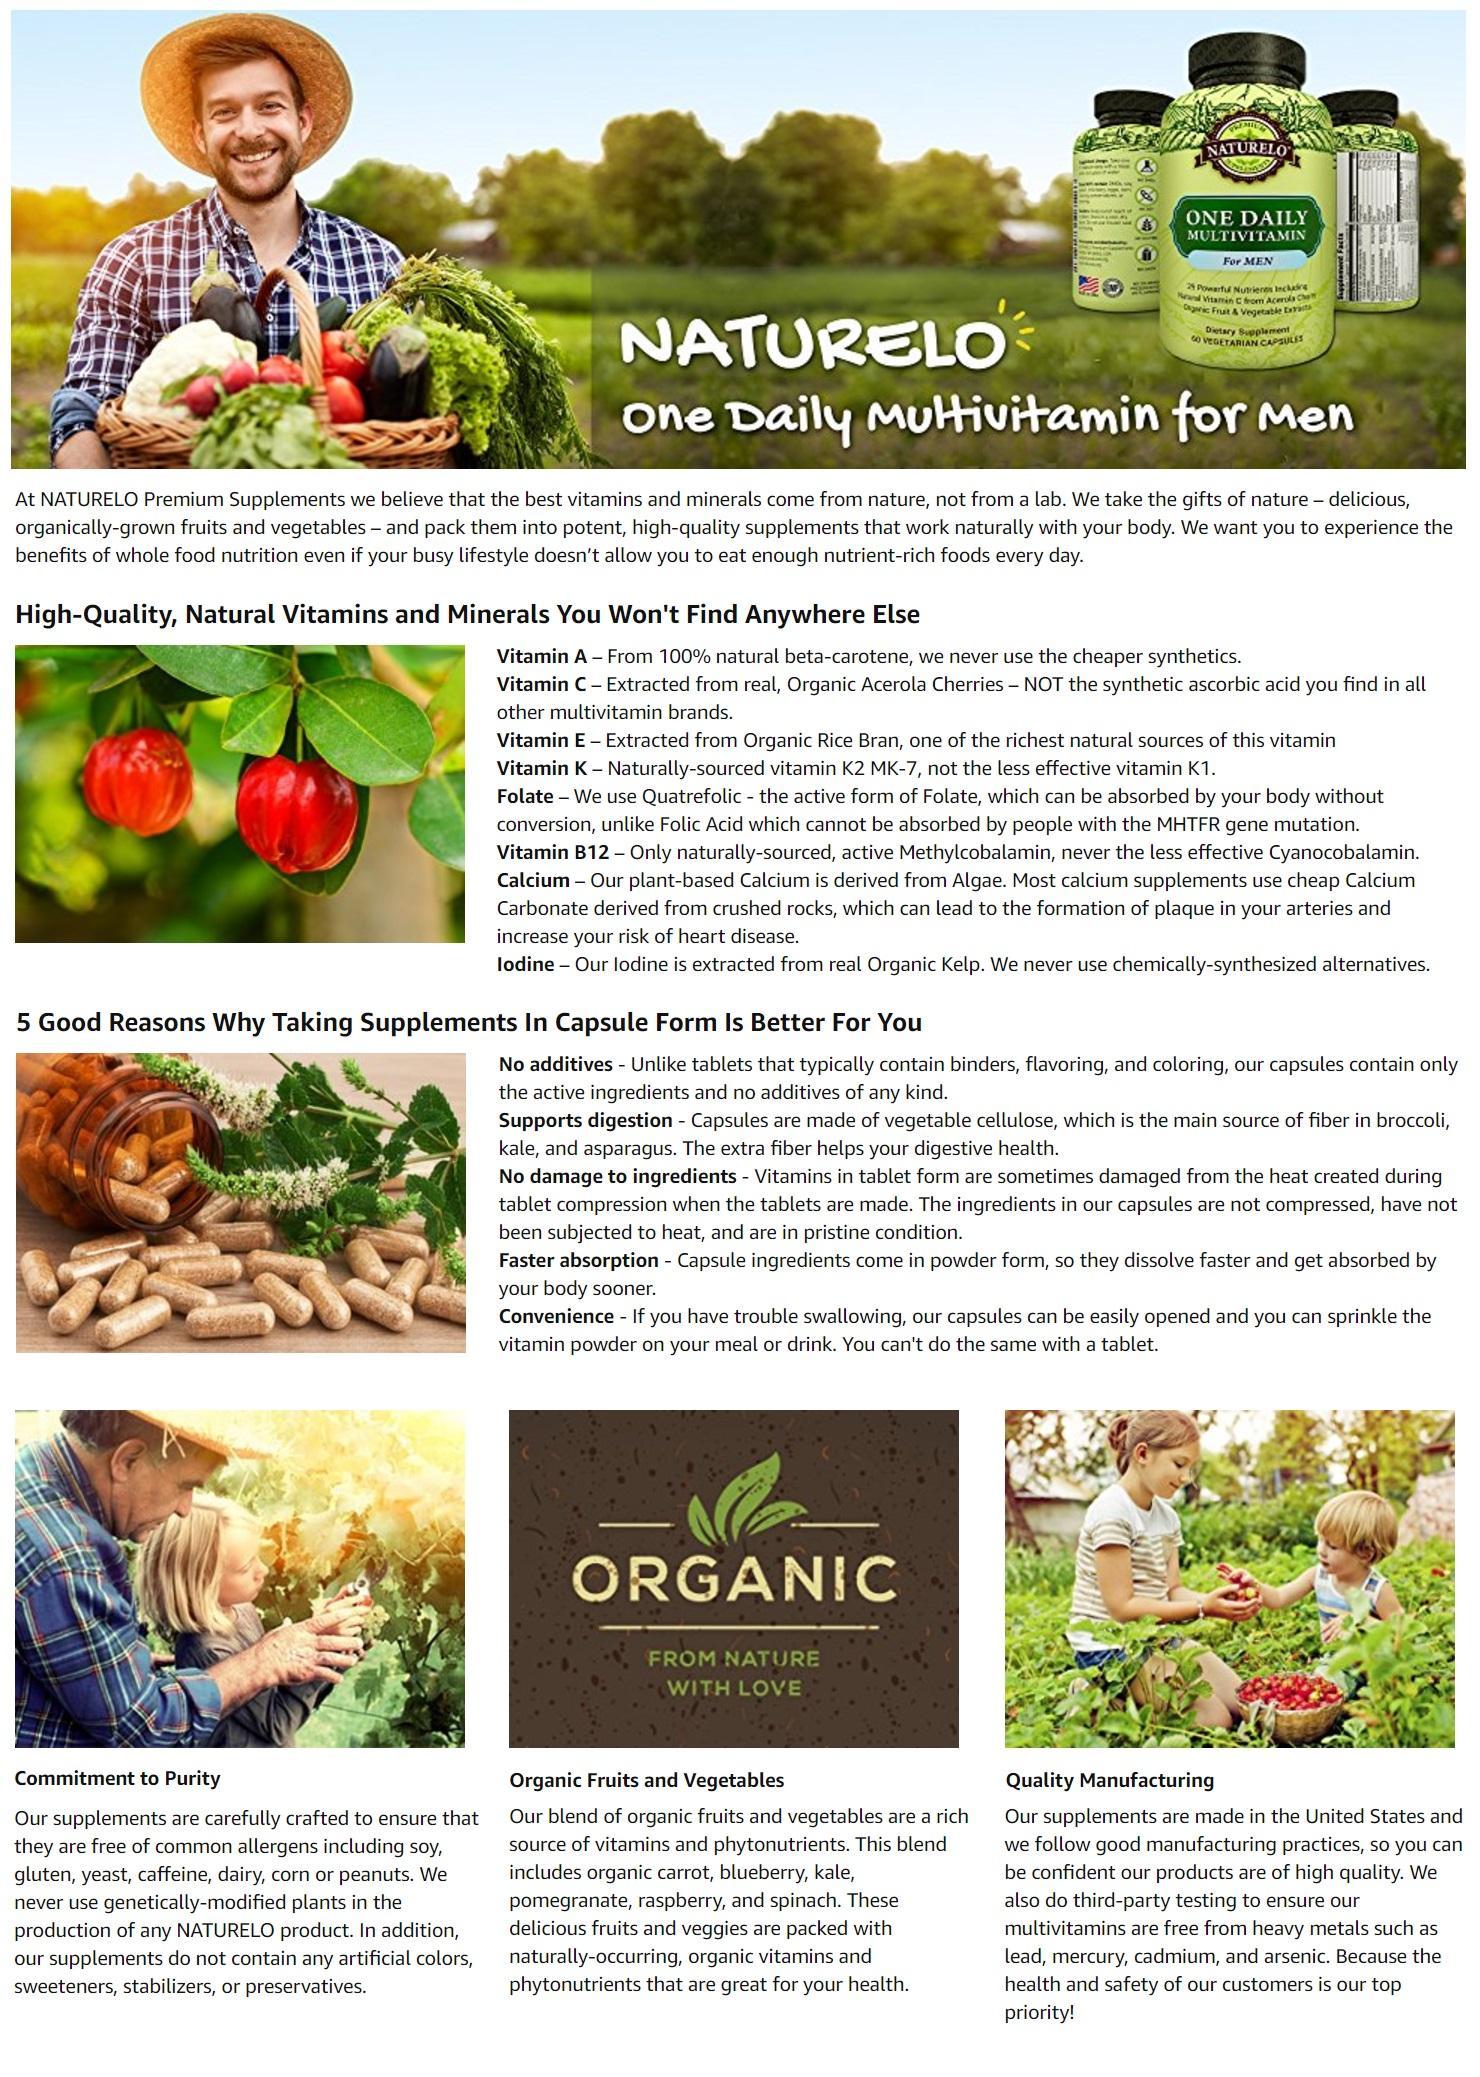 05 Brochure Naturelo - ONE DAILY MEN MULTIVITAMIN.jpg